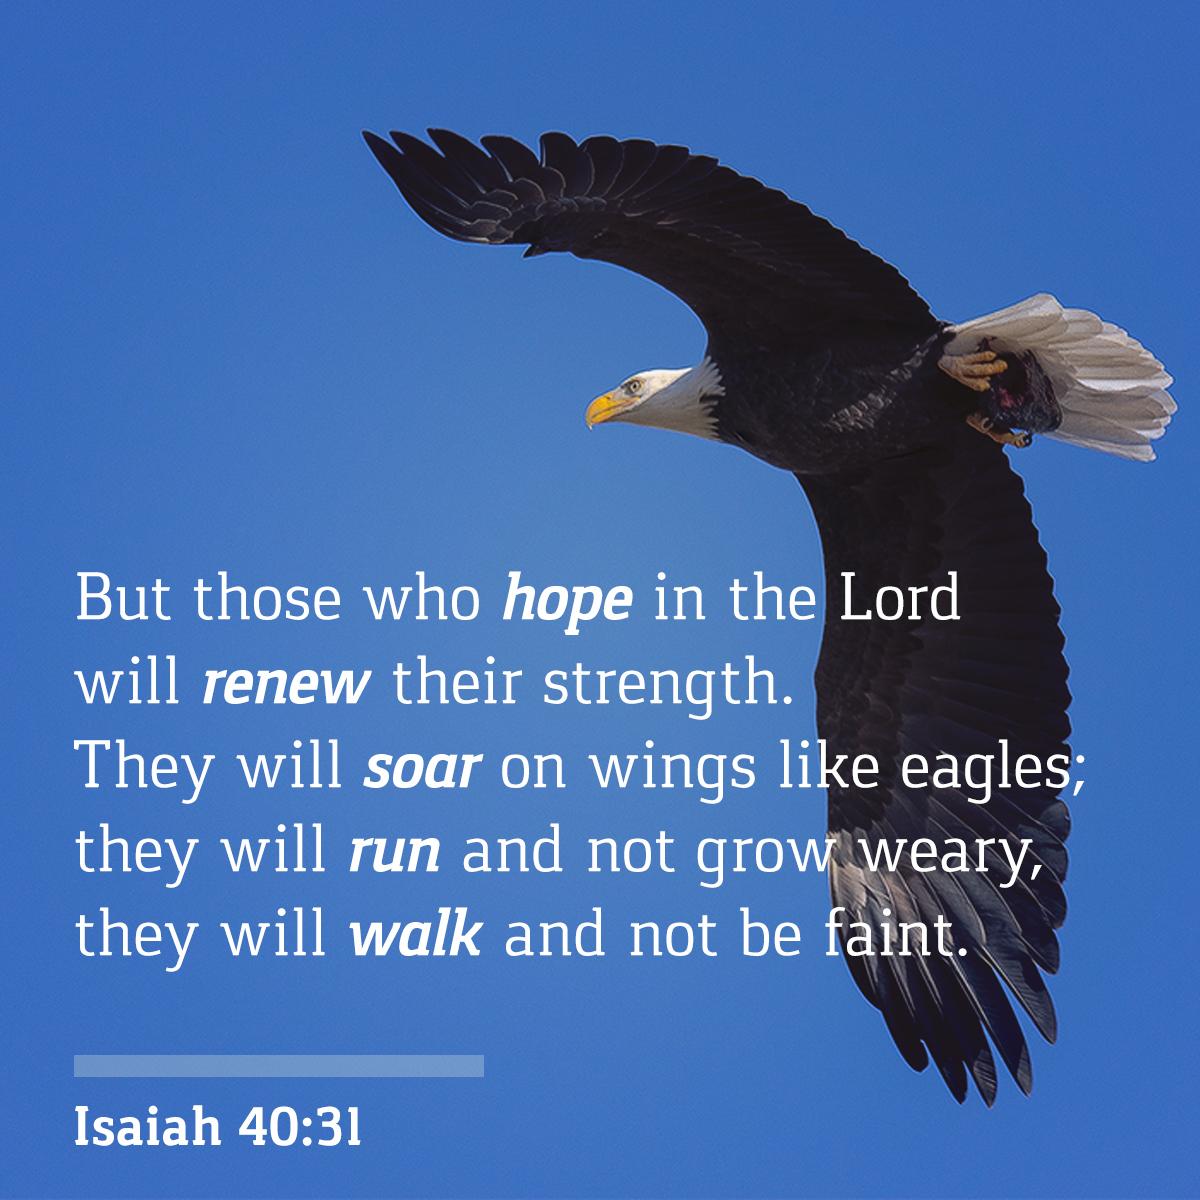 Isaiah - 40:31